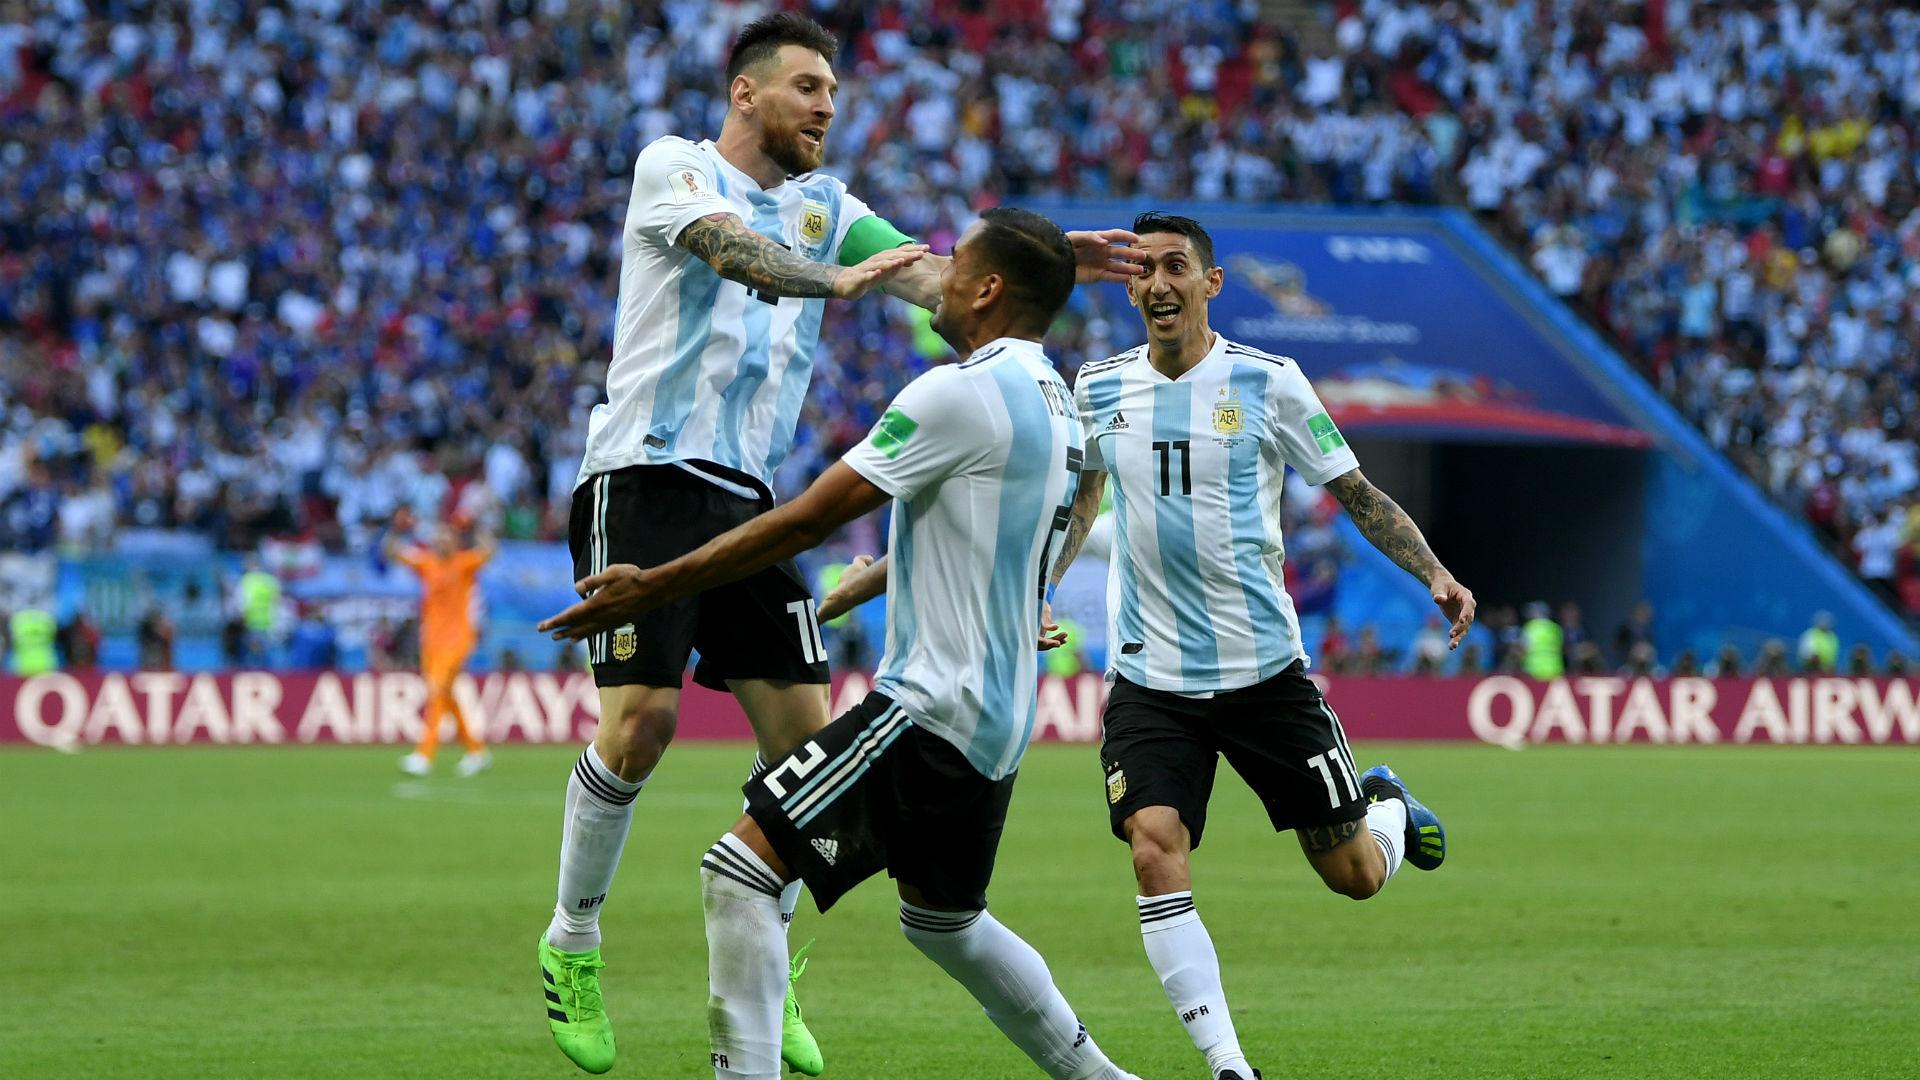 France World Cup win: Superstar Mbappe sends Messi ...